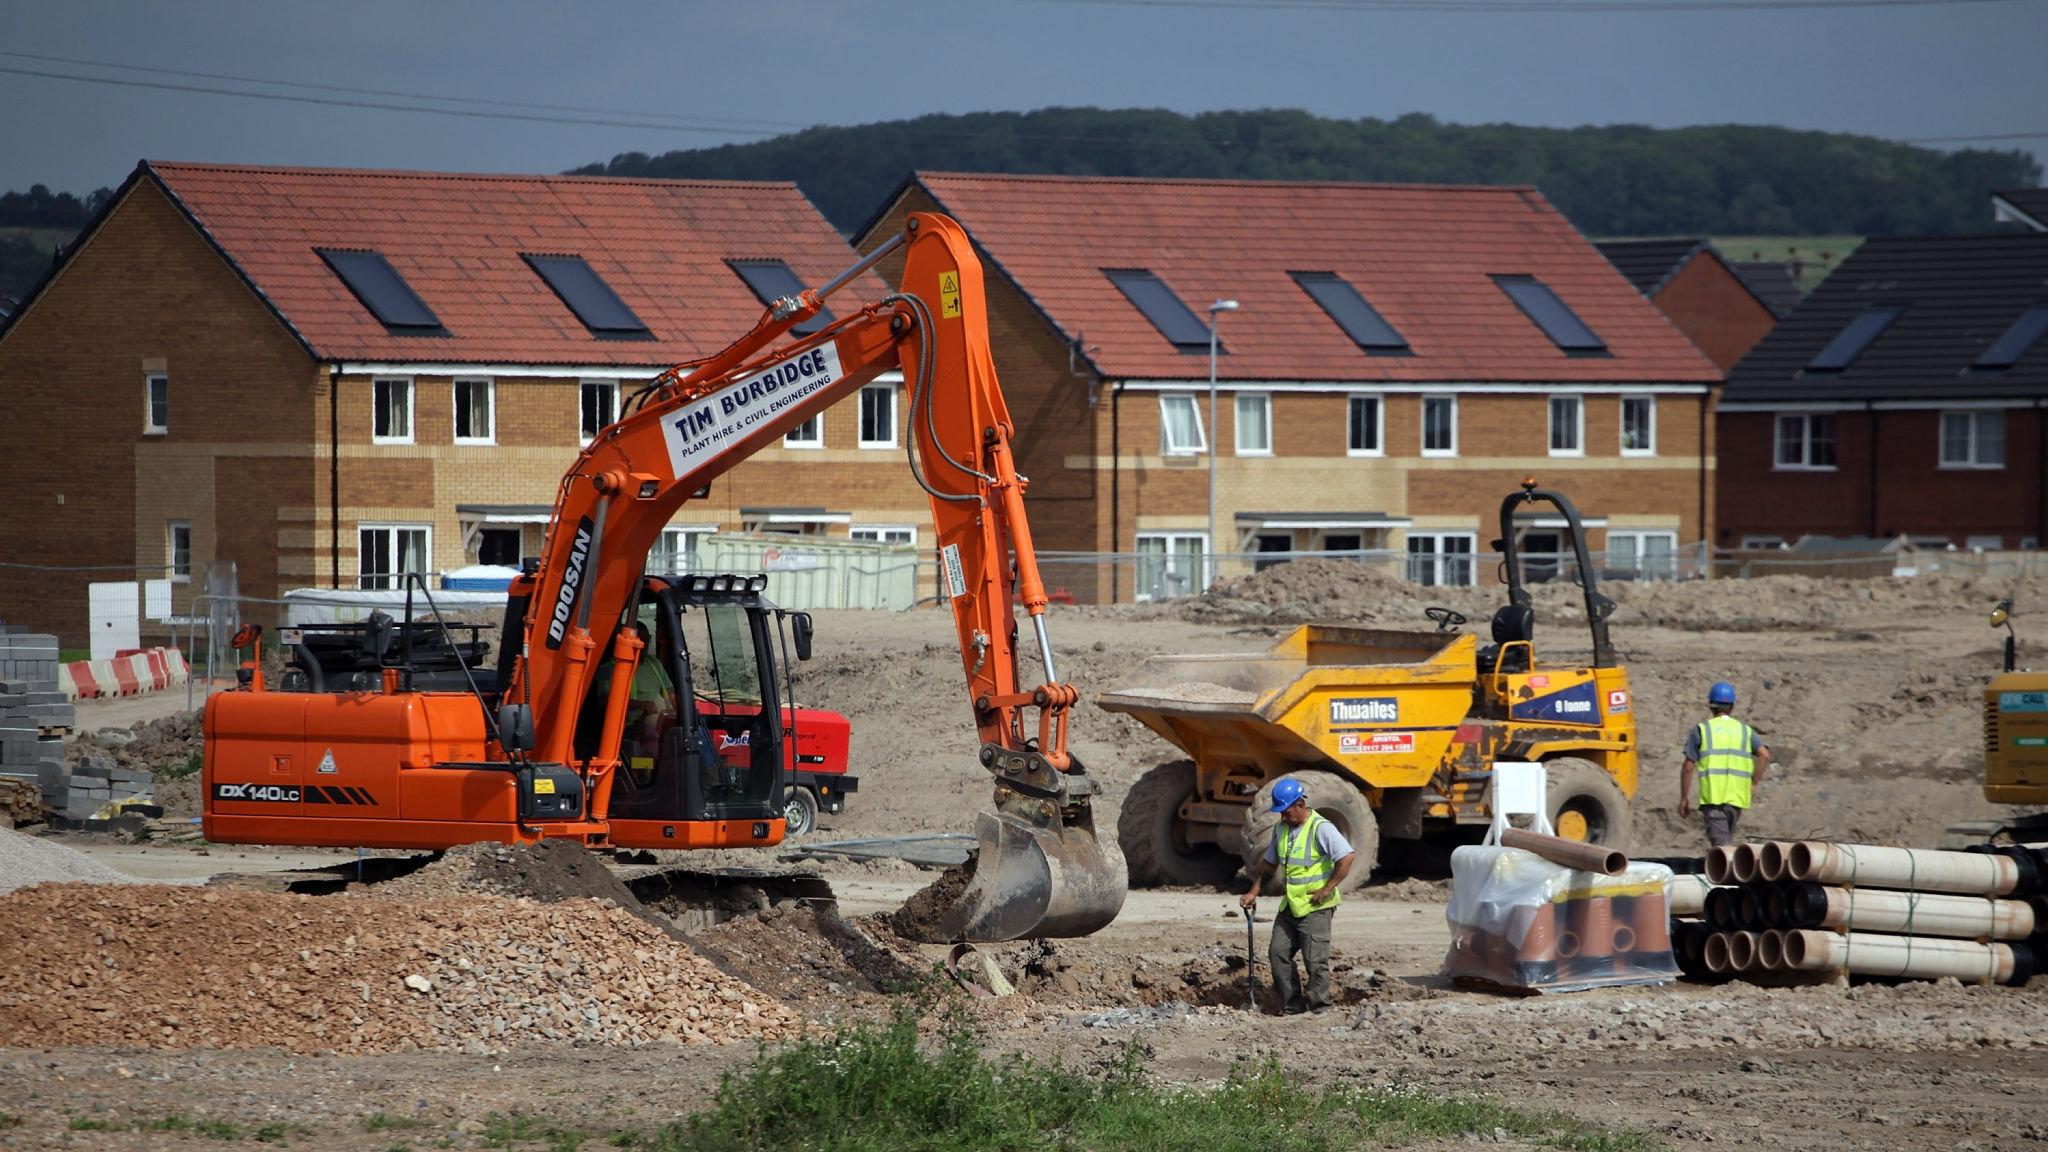 Britain's housing market needs a permanent fix